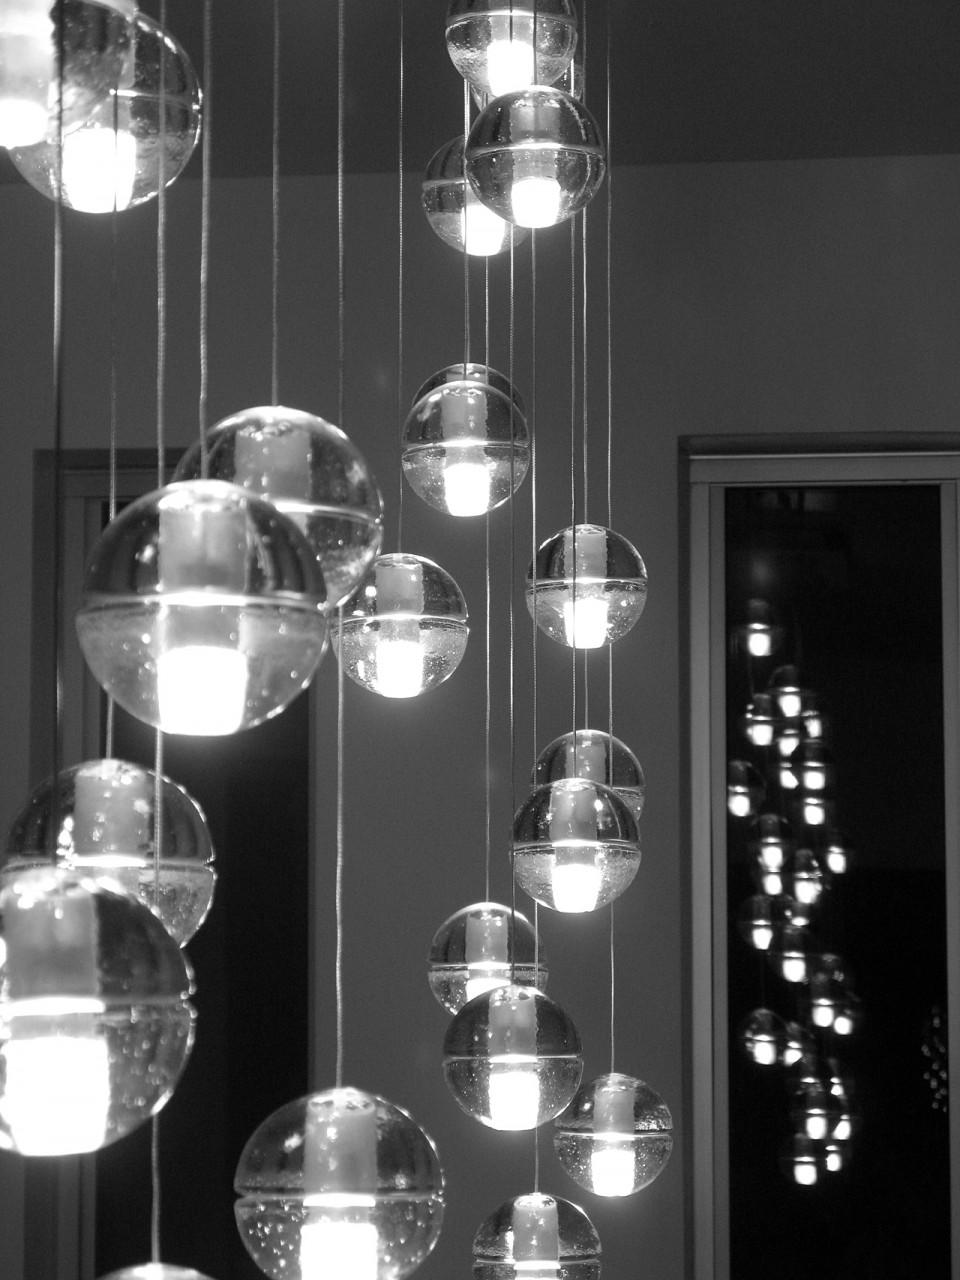 Bocci pluie de luminaires intemporels venu du canada for Luminaire contemporain